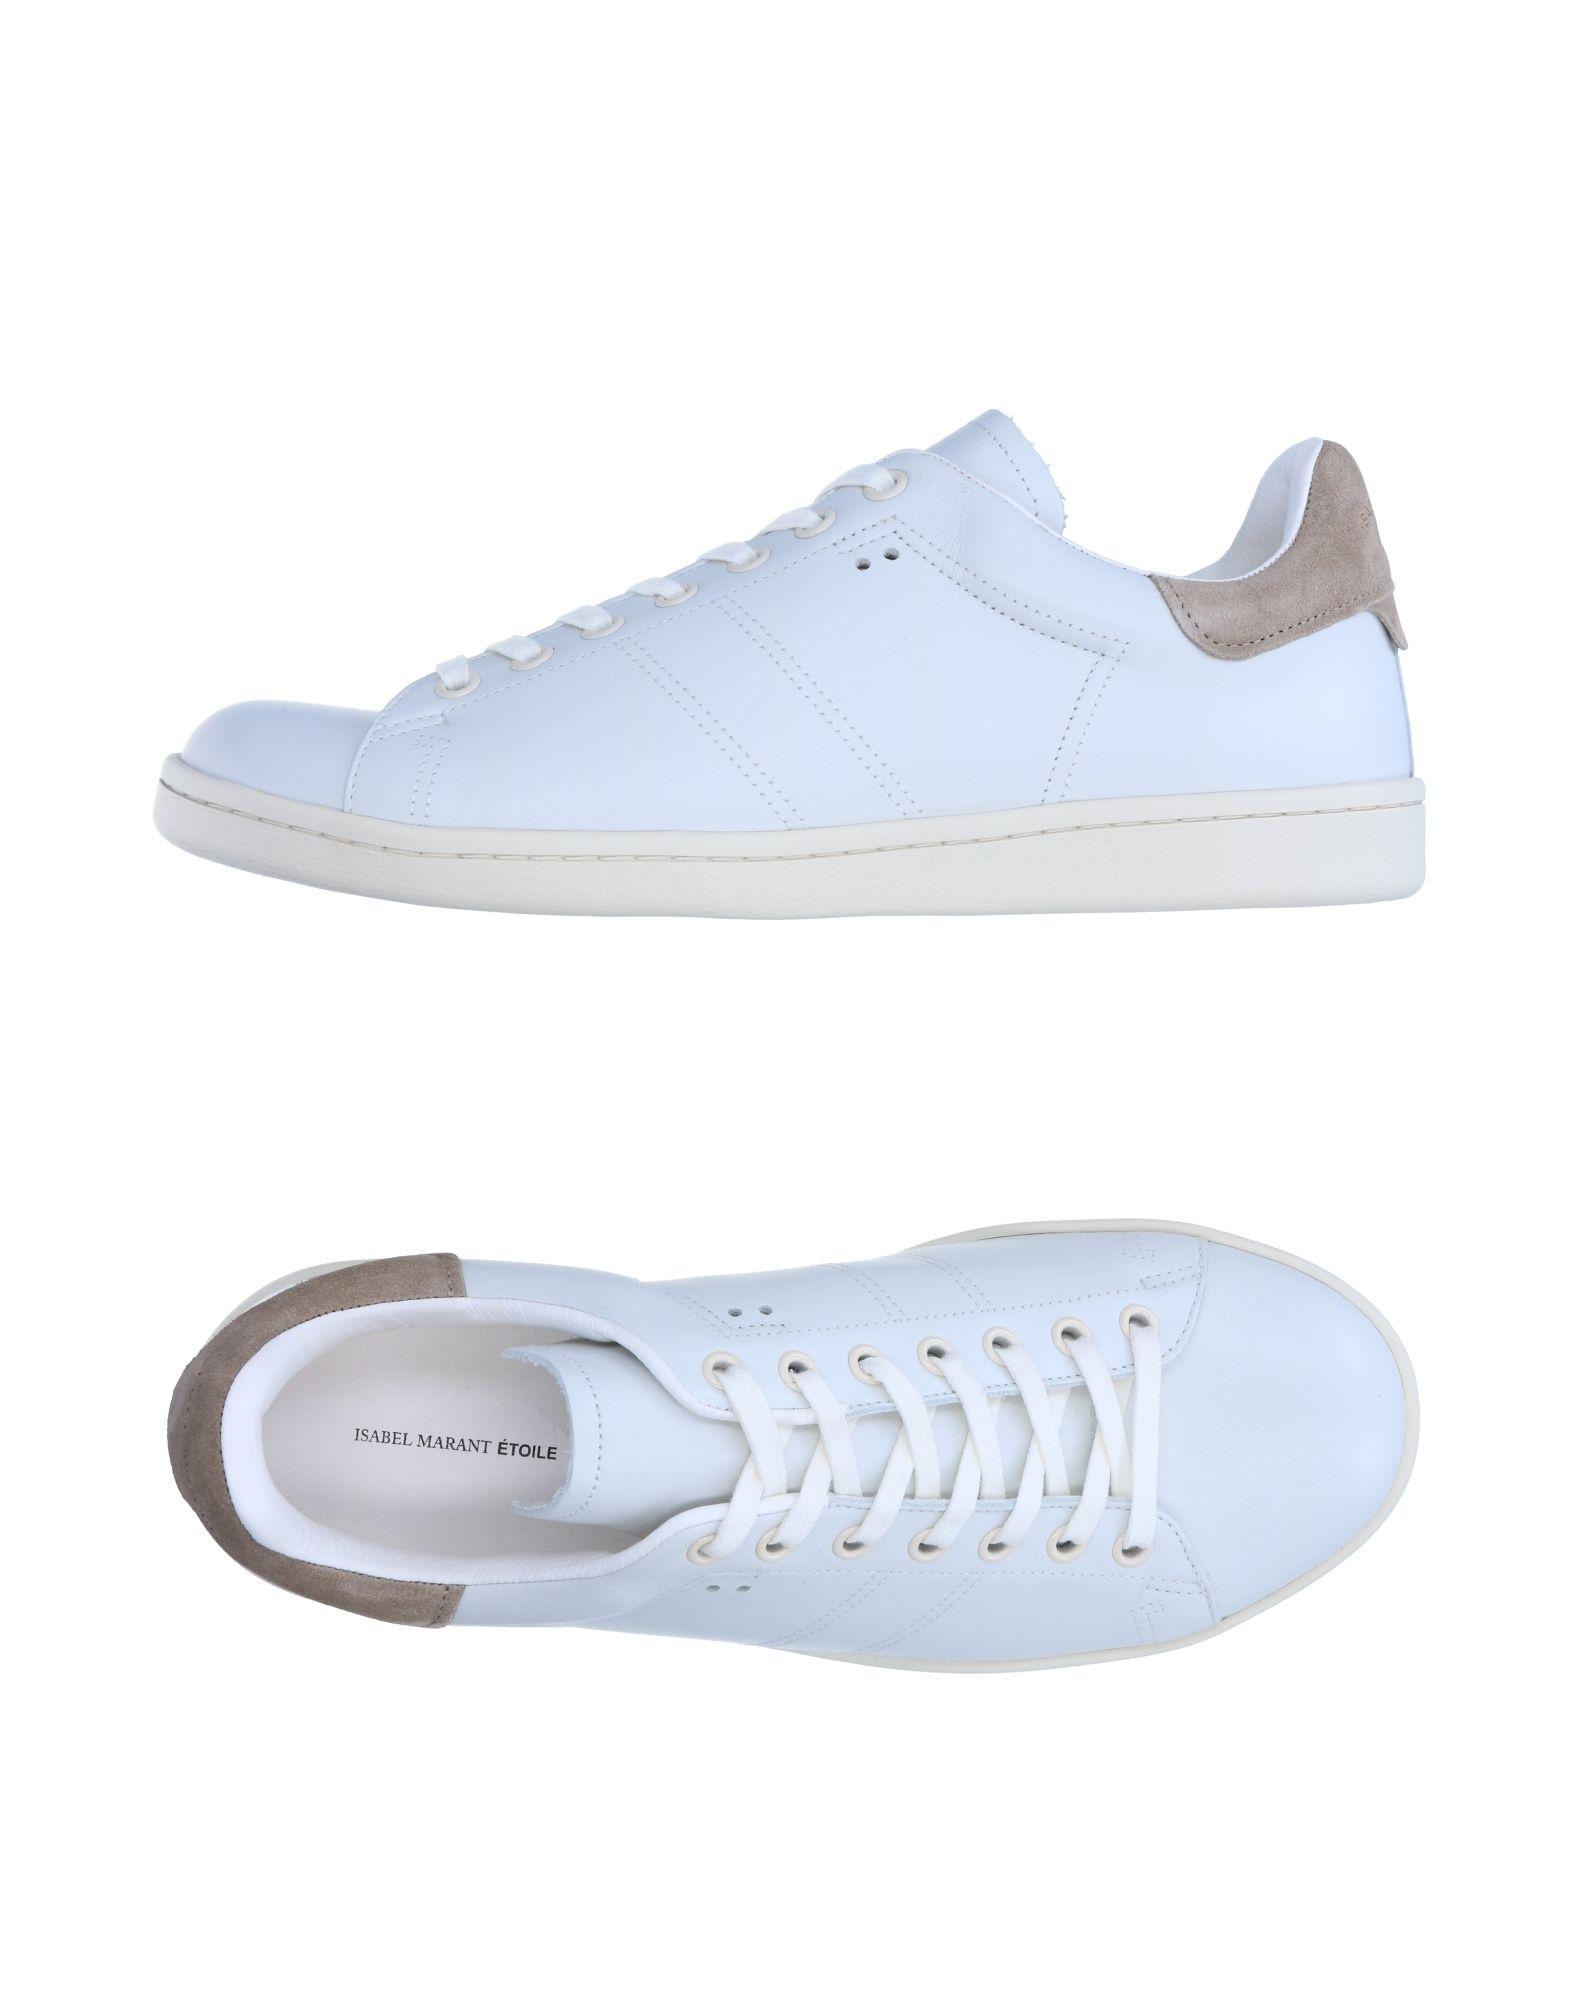 Isabel  Marant Étoile Sneakers Damen  Isabel 11249169OJGut aussehende strapazierfähige Schuhe 52c568